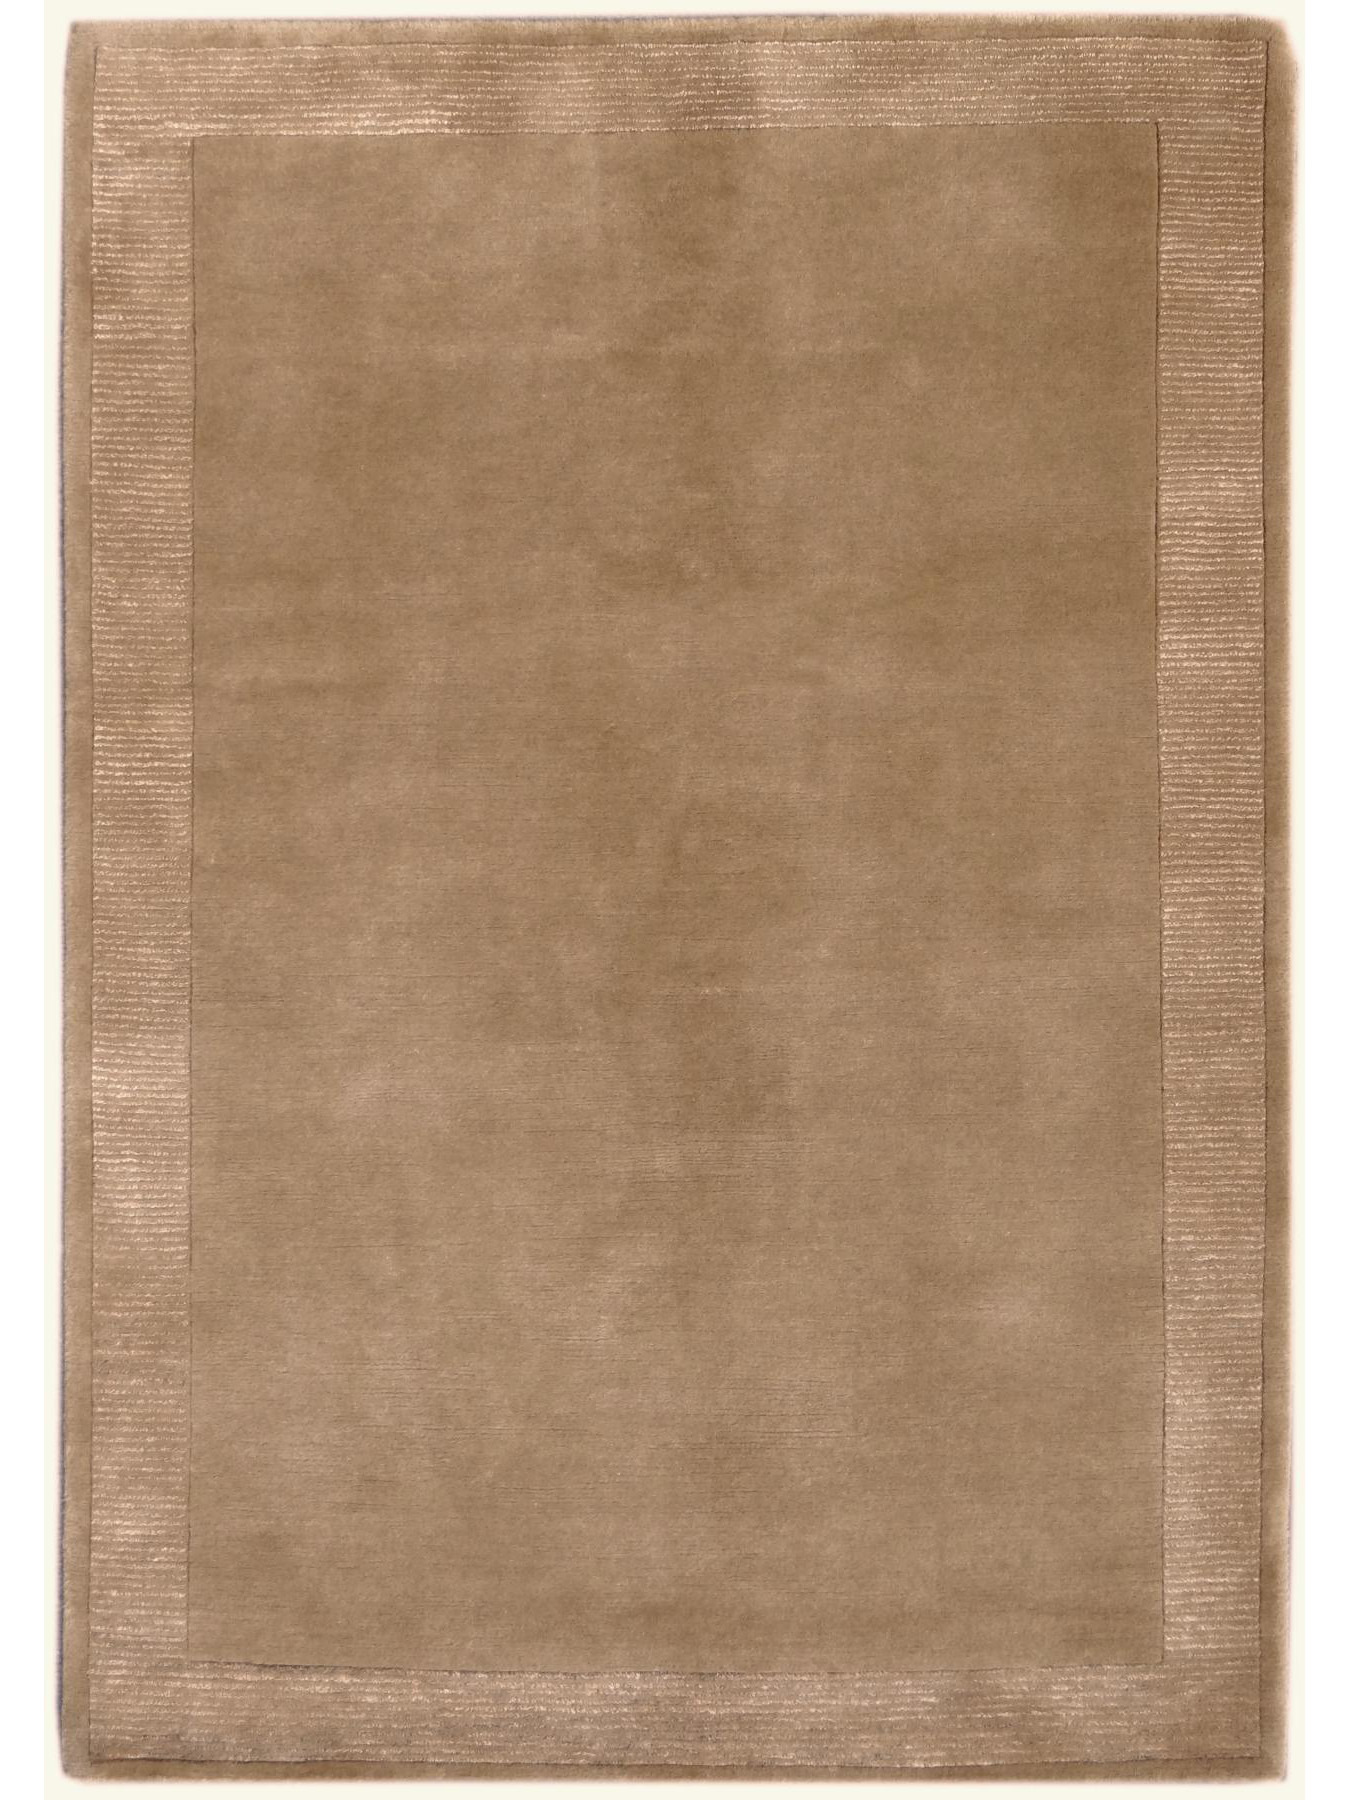 Carpets with borders - SMOKE 1 - H3303